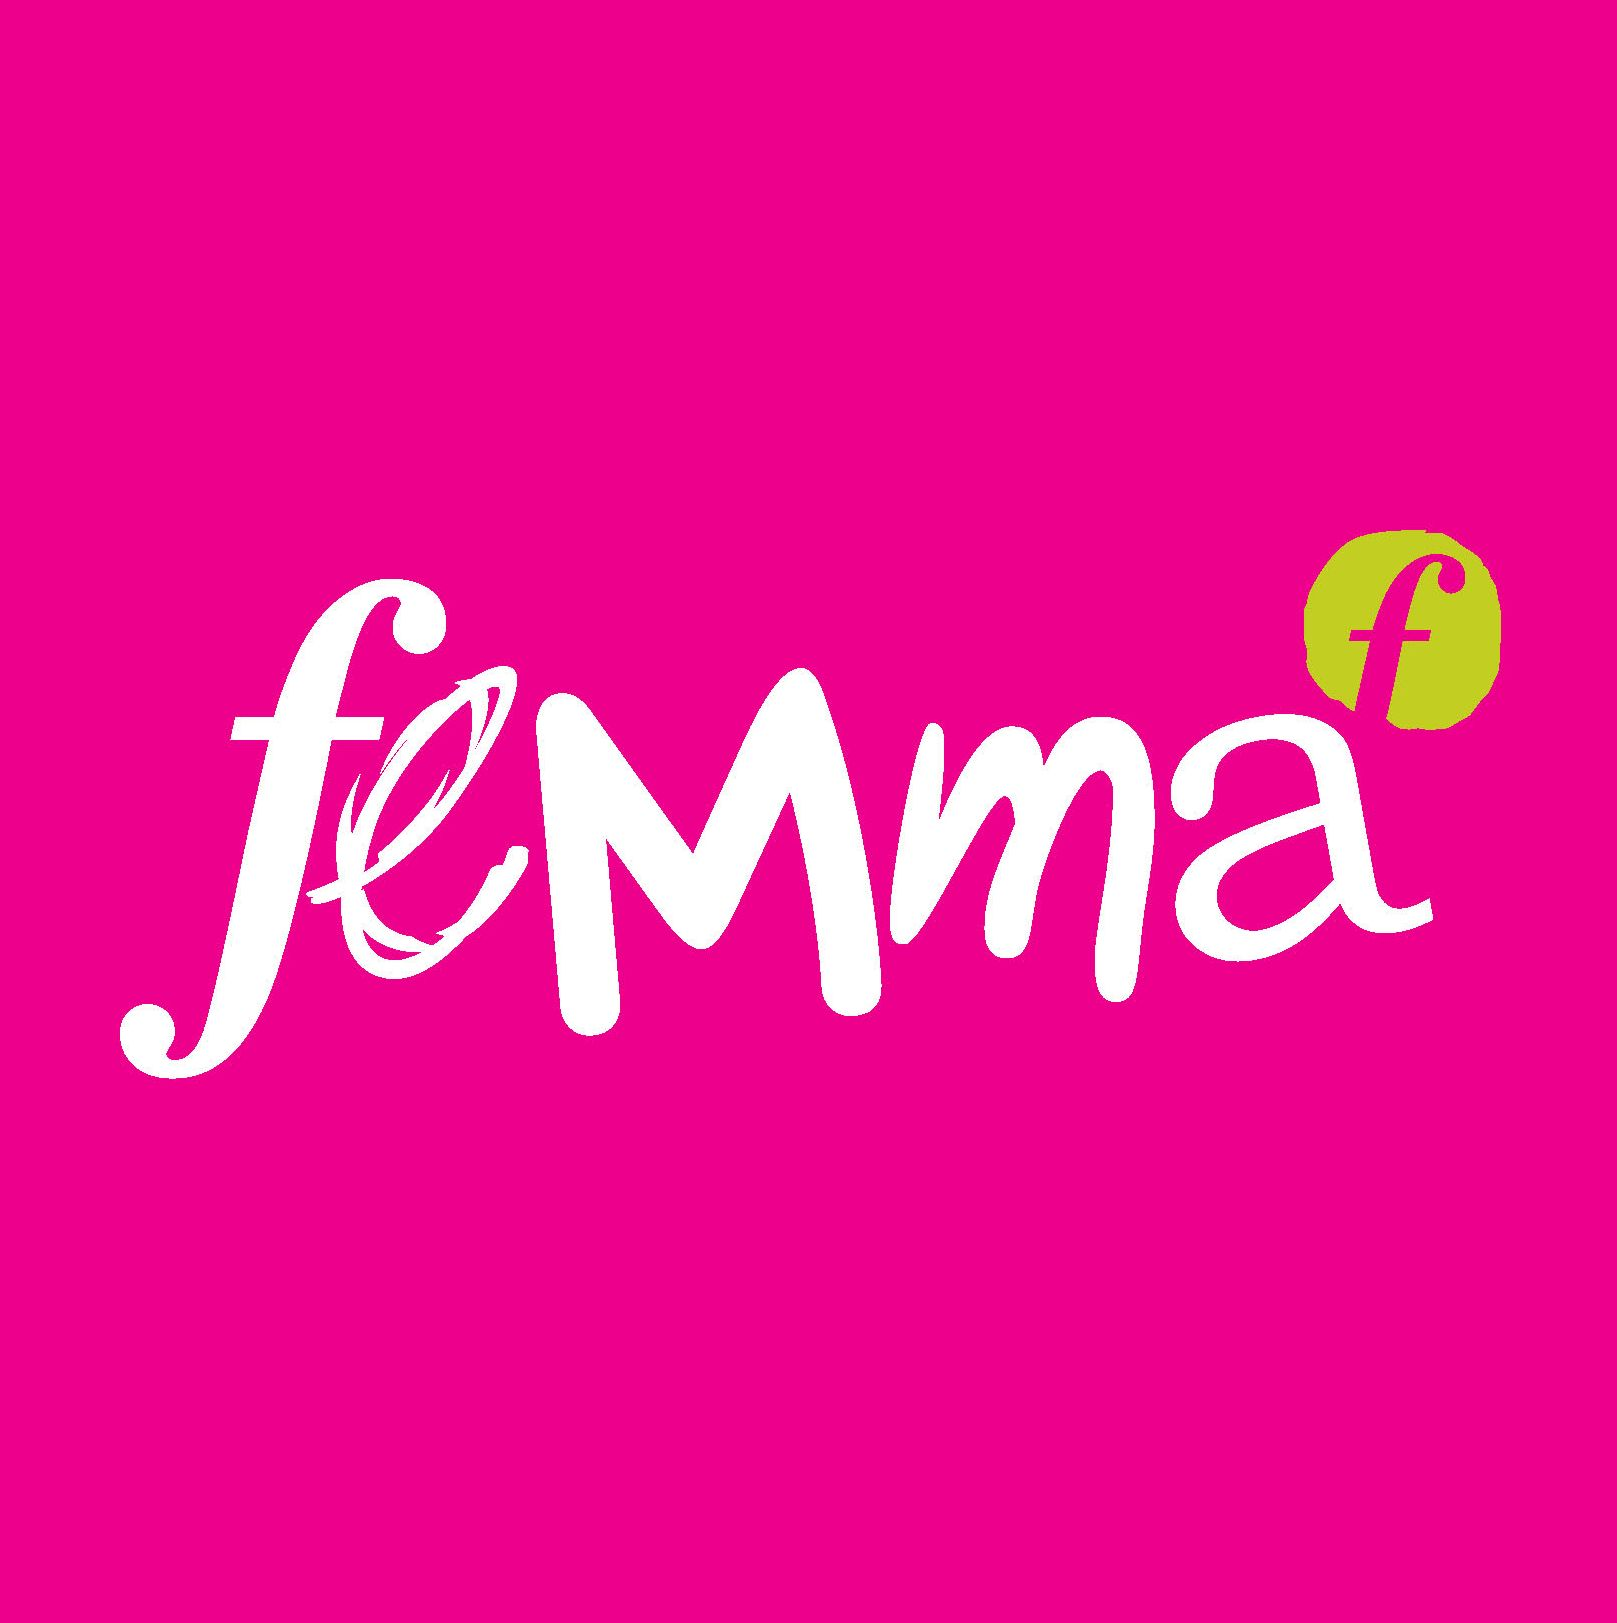 logo-femma-magenta-wit